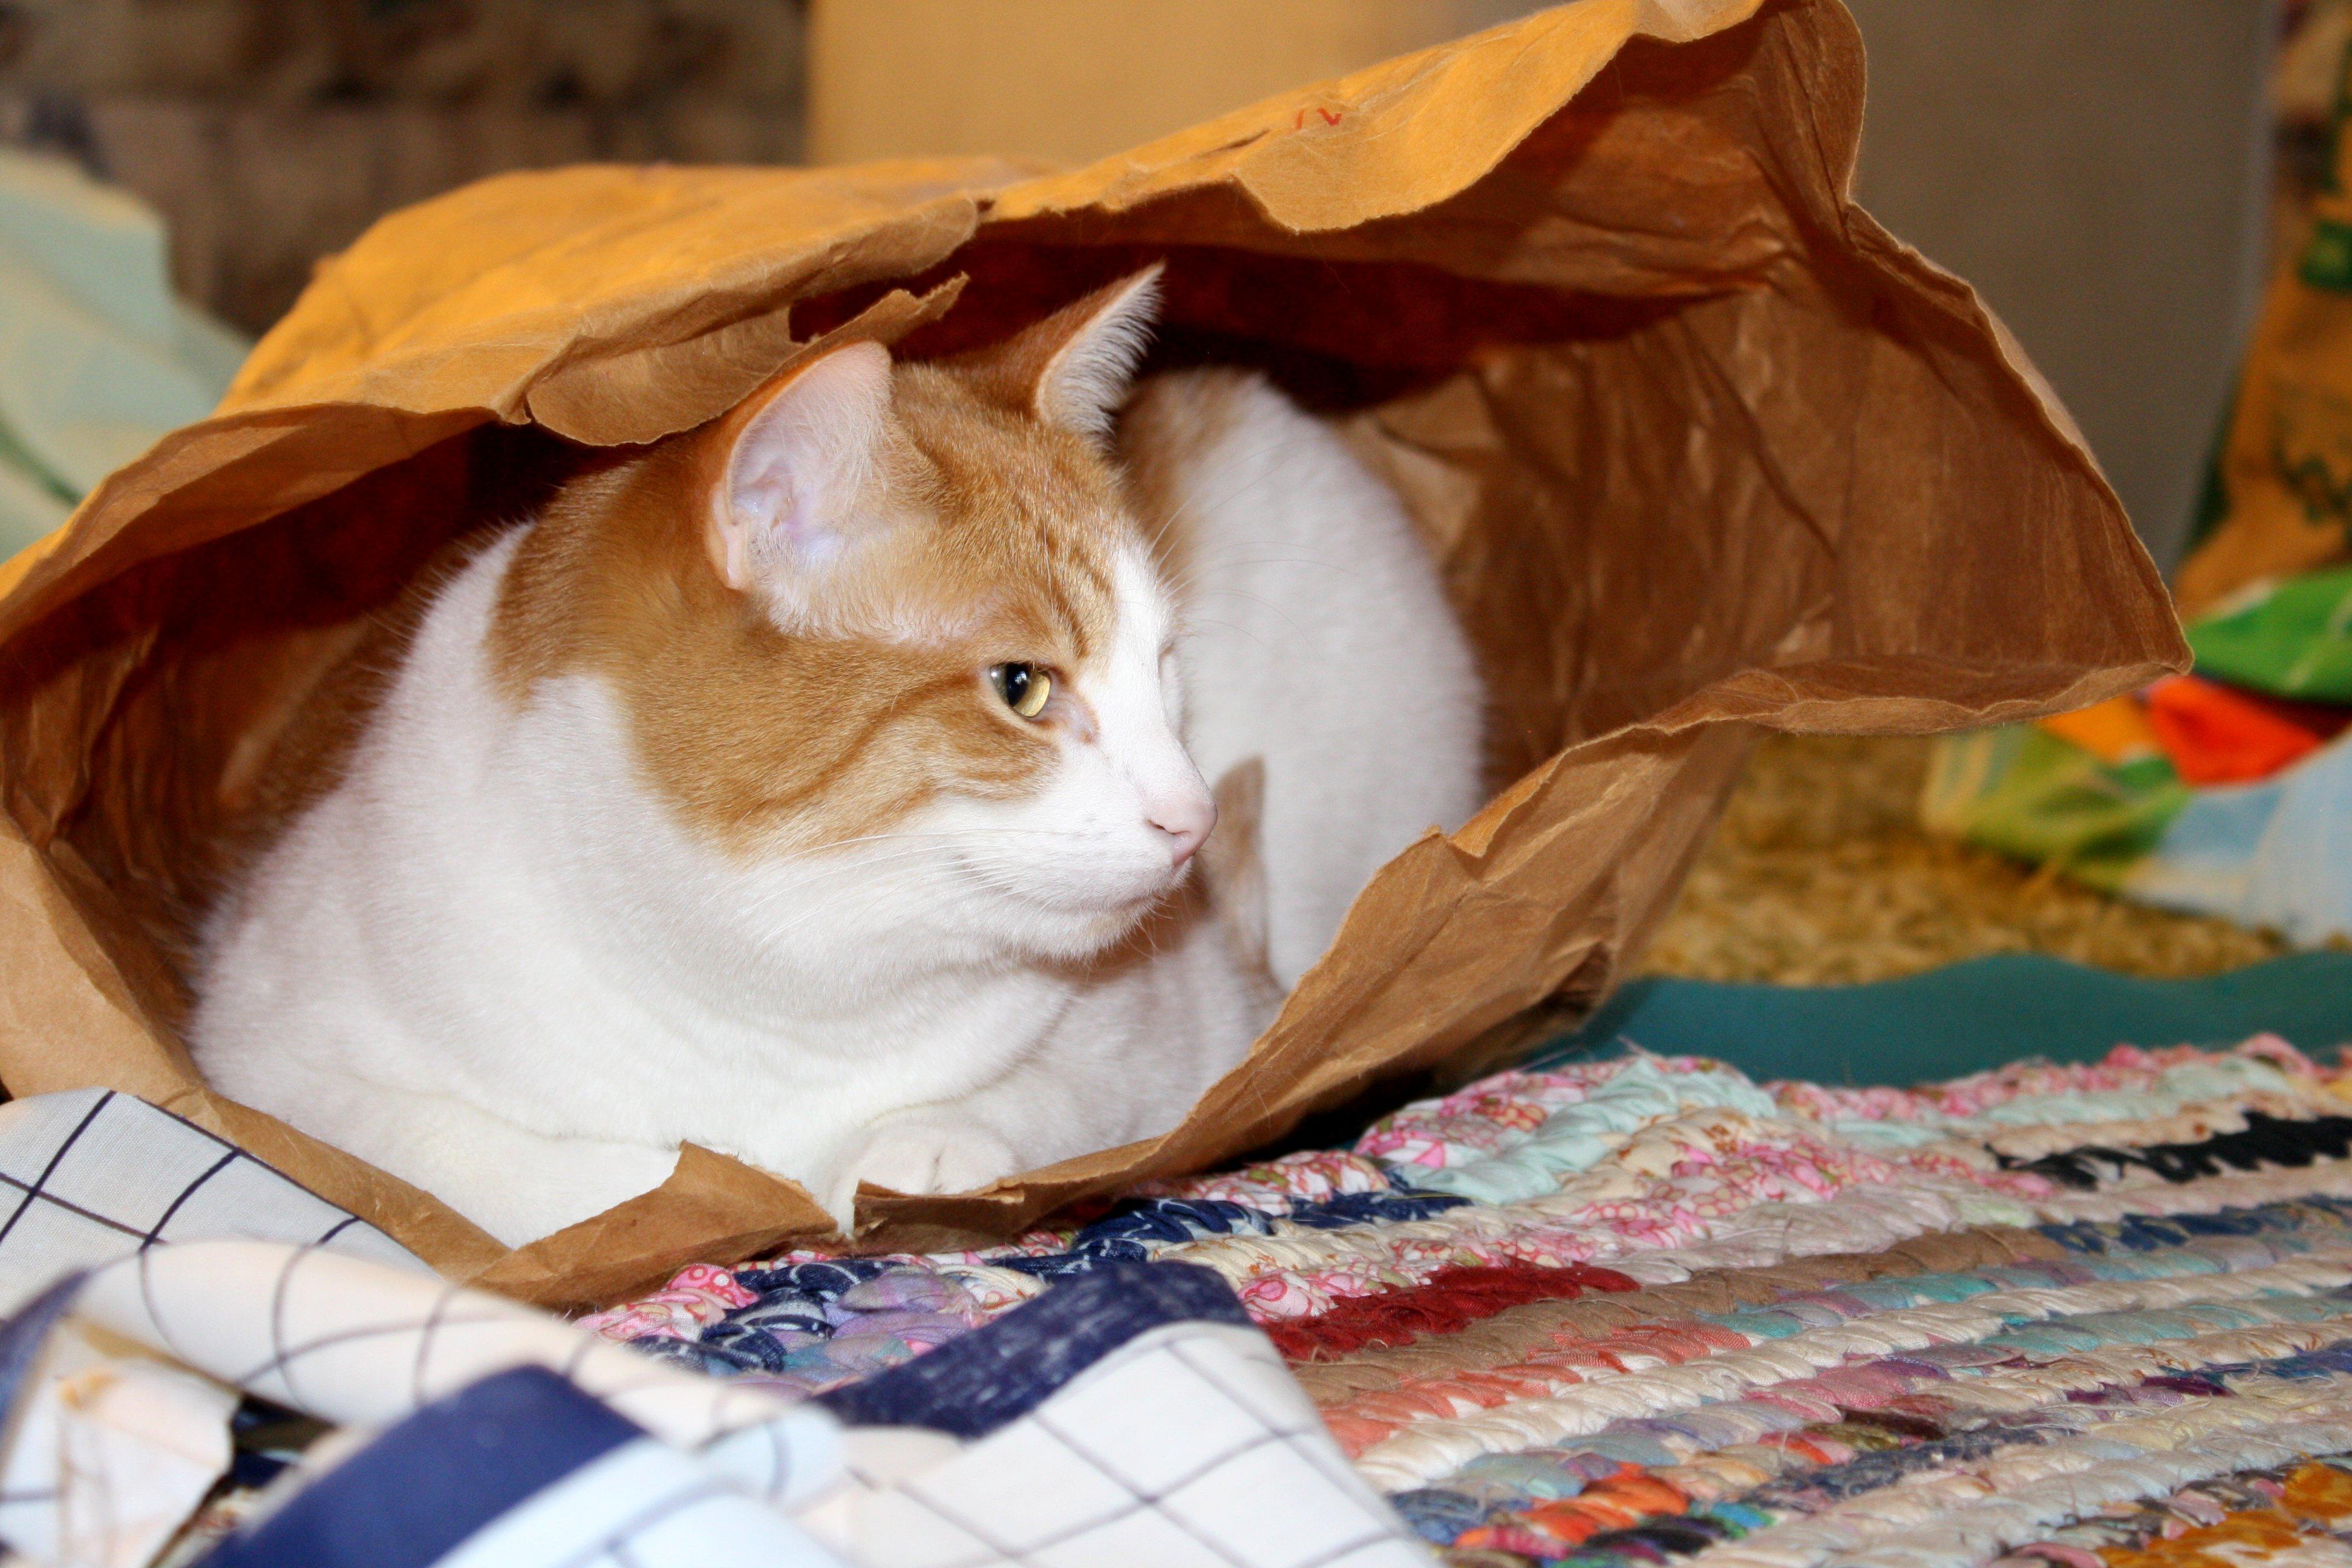 Cat In Paper Bag Picture Free Photograph Photos Public